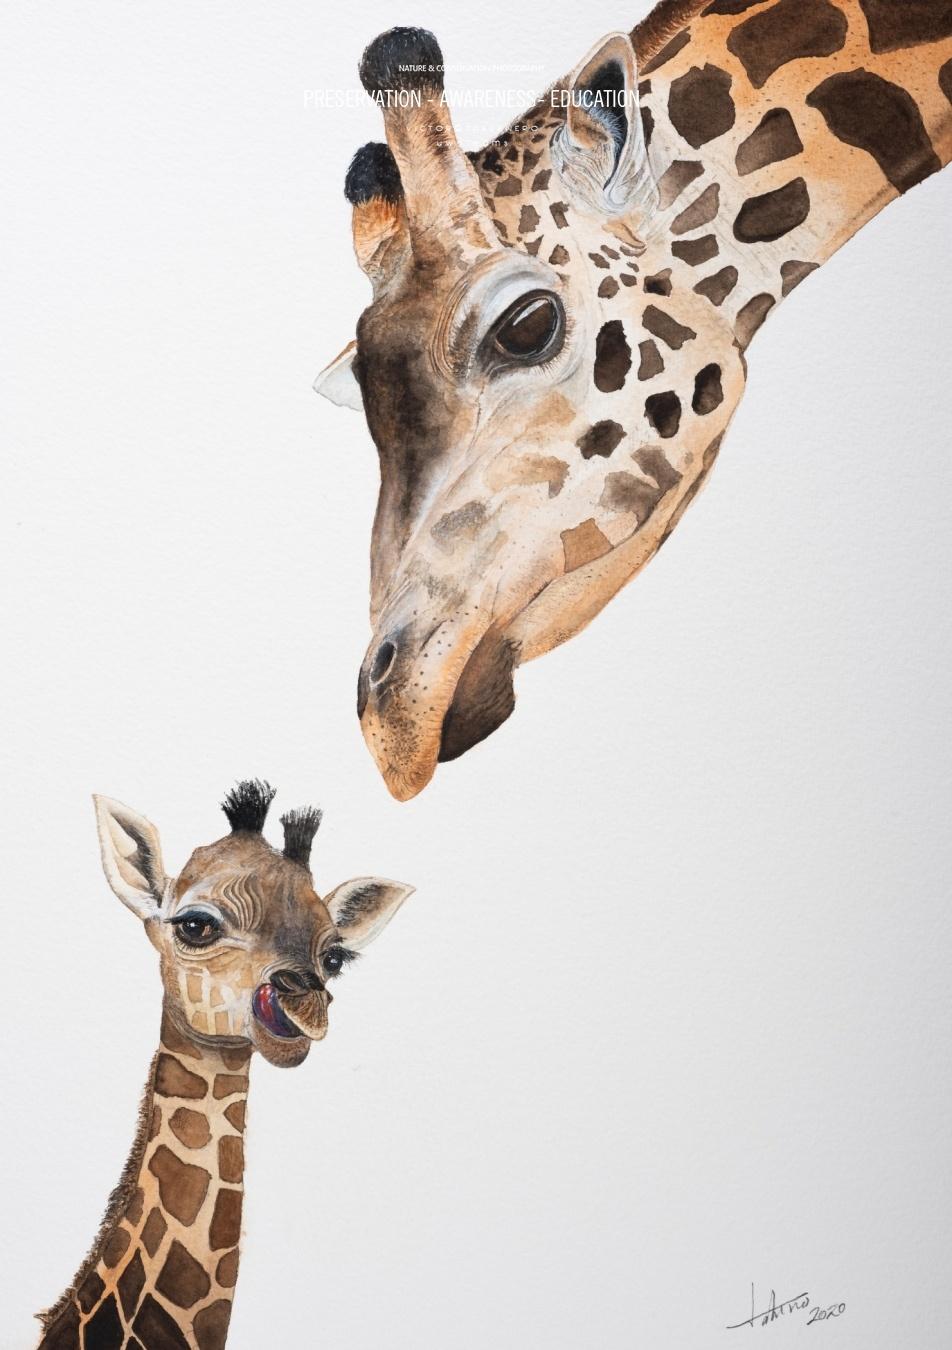 Jirafas - 31x41 - Vida Salvaje - Wildlife Conservation Photography, UWDREAMS.COM